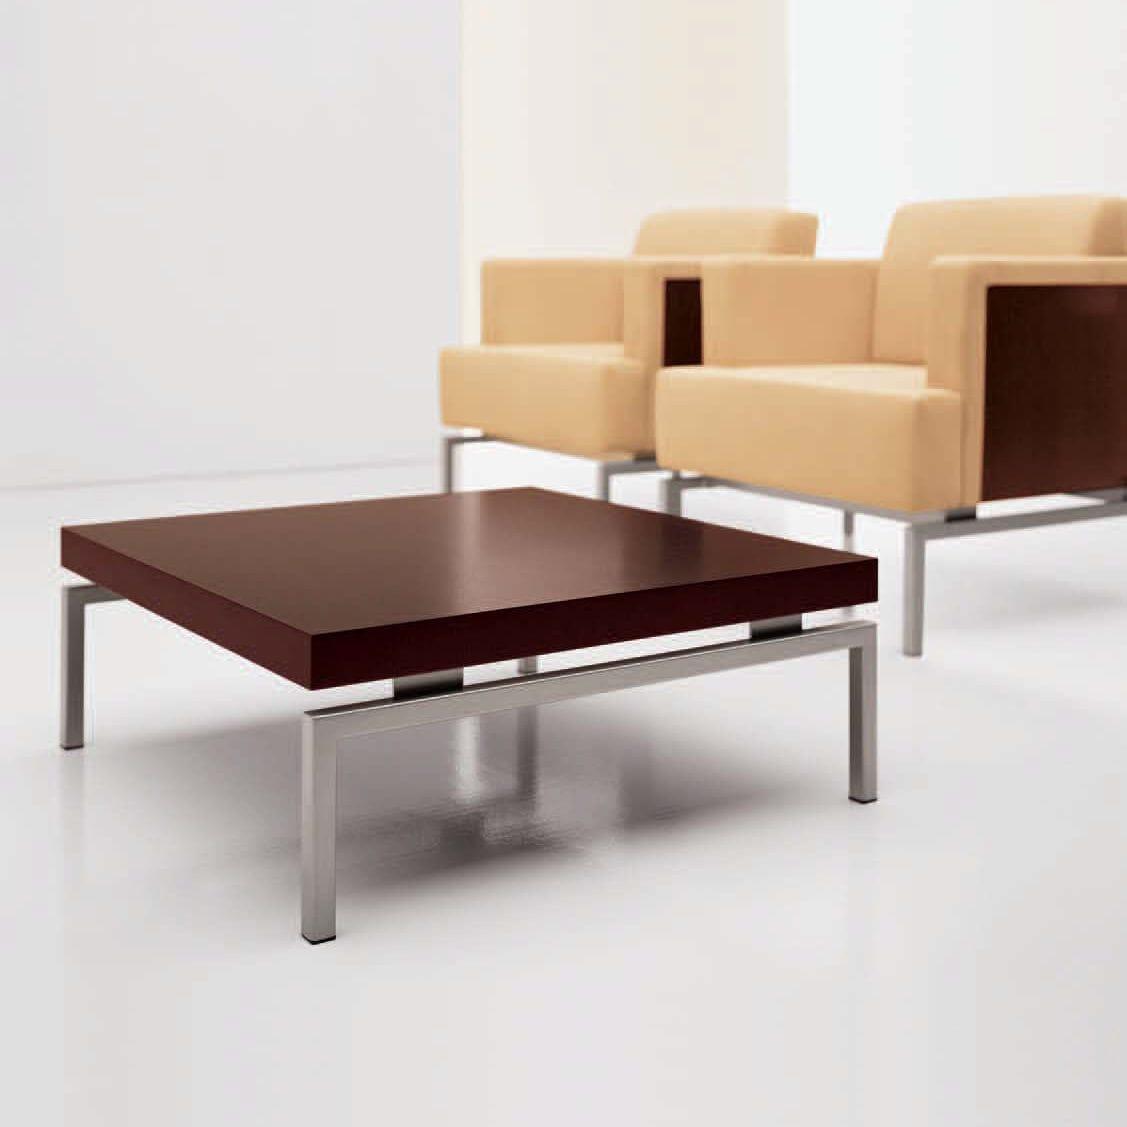 Contemporary Coffee Table / Wooden / Metal / Rectangular   SUTTON